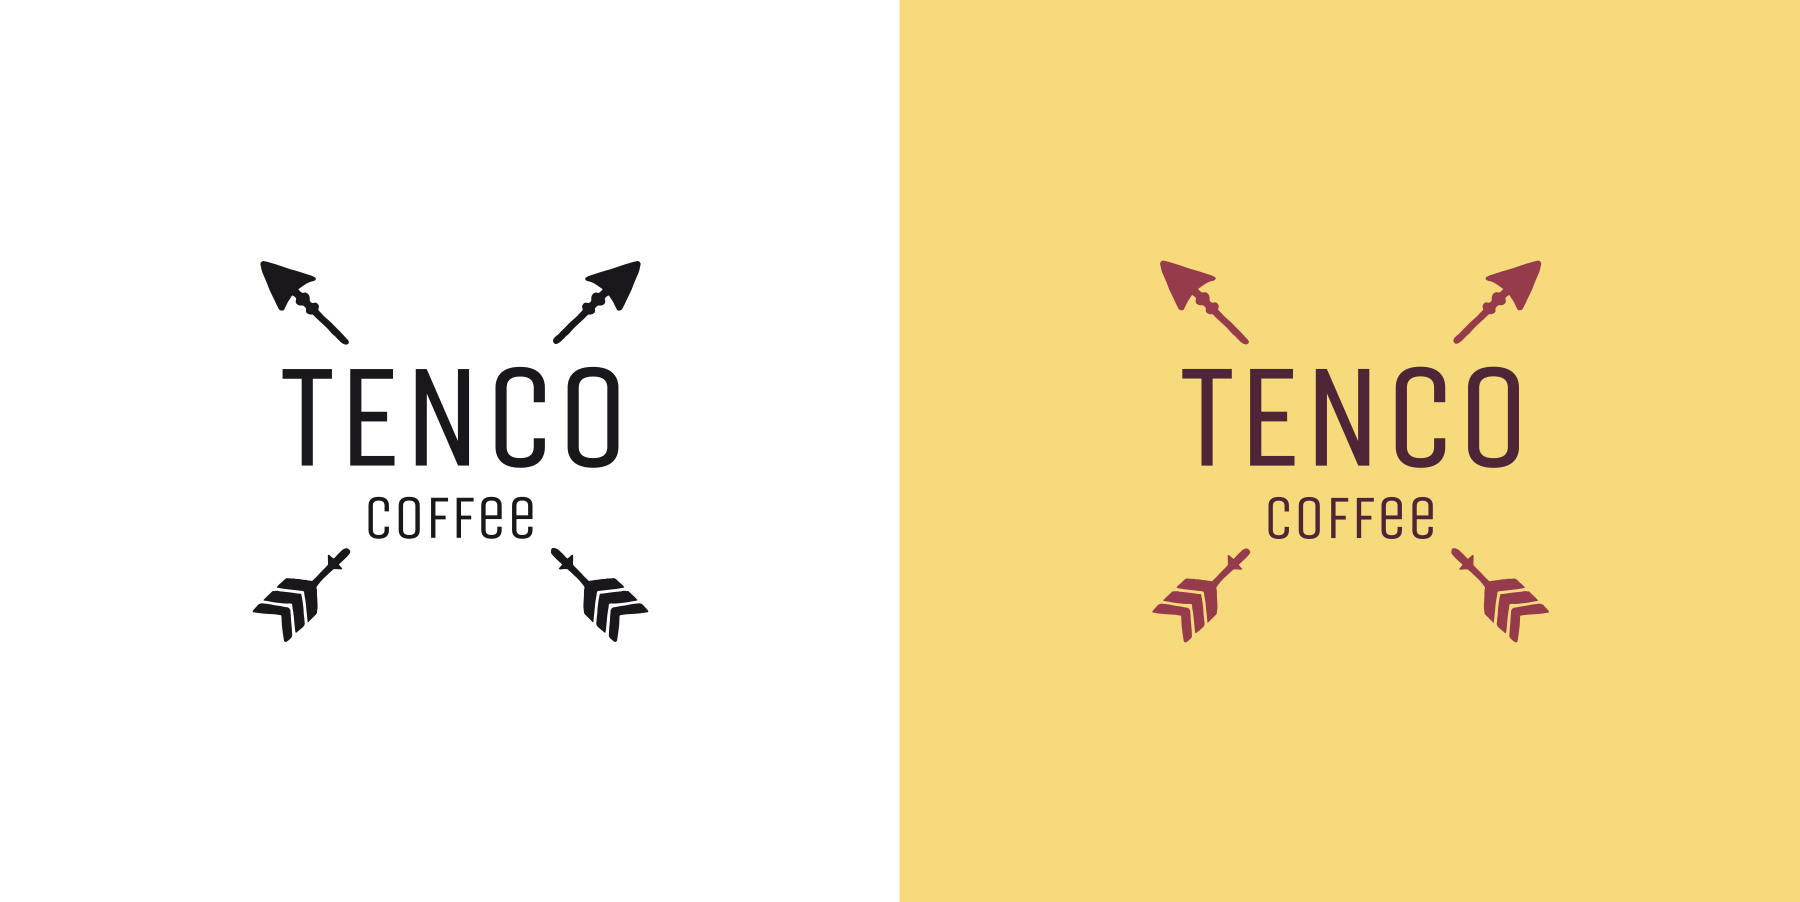 Carole_Chevalier-Tenco-Coffee-3.jpg